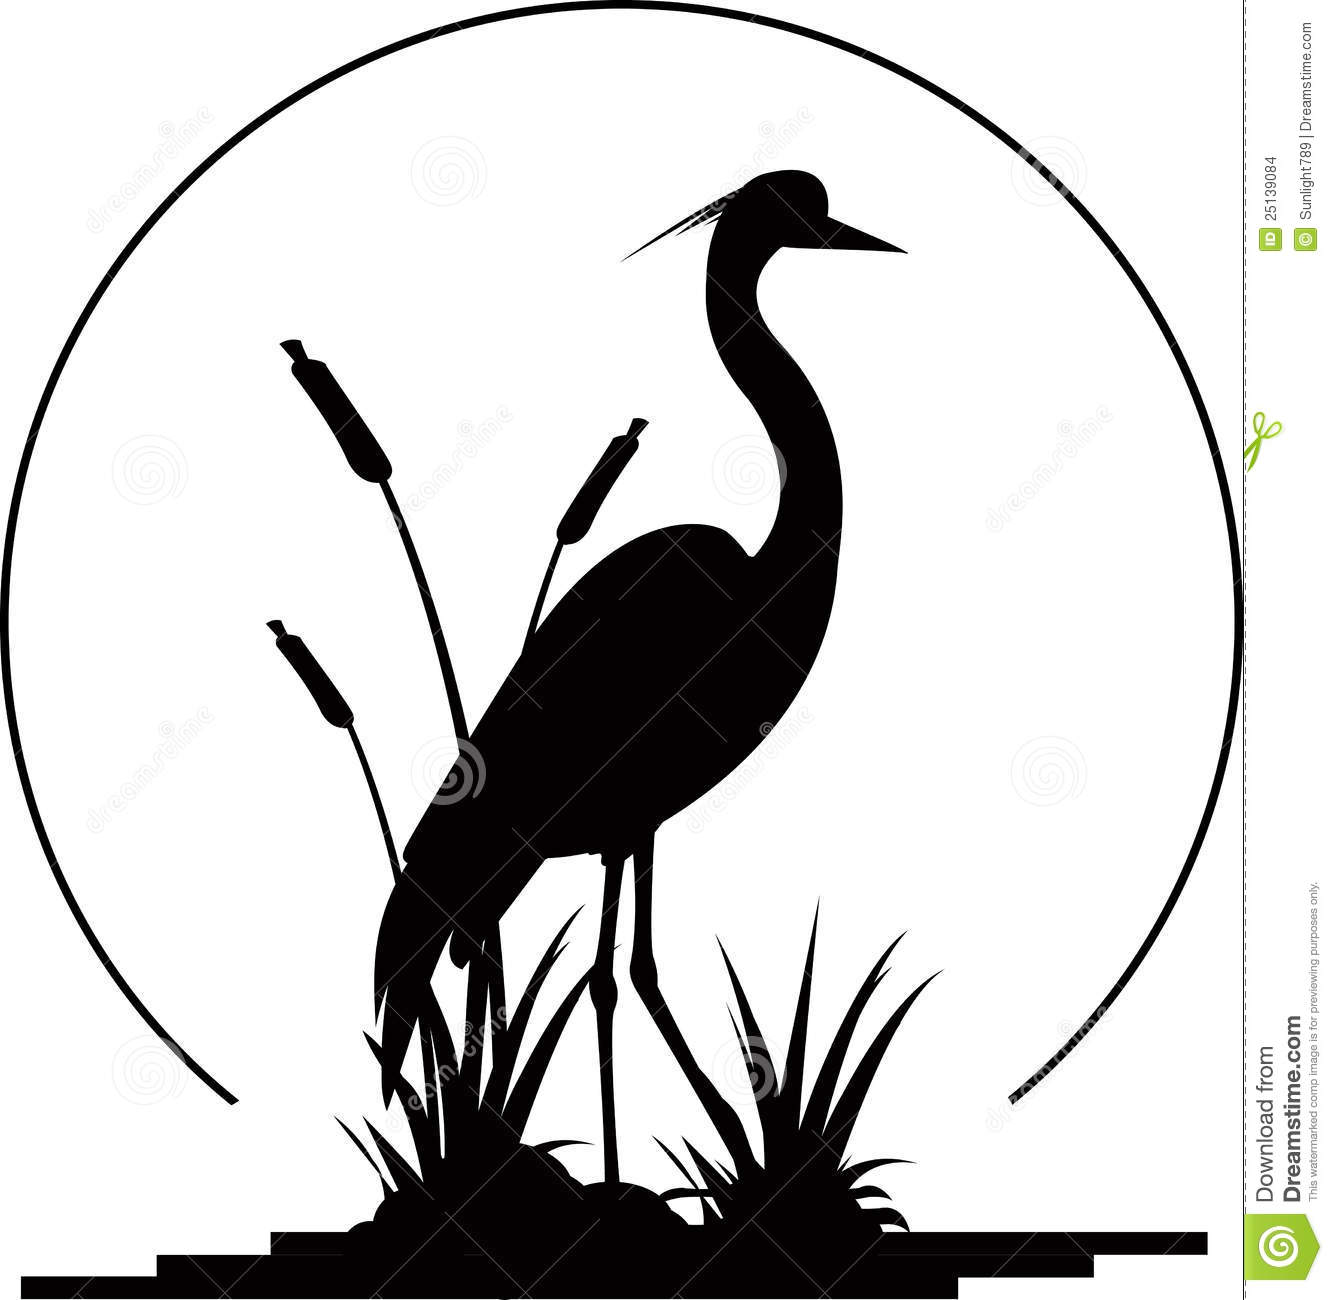 1333x1300 Heron Flying Silhouette